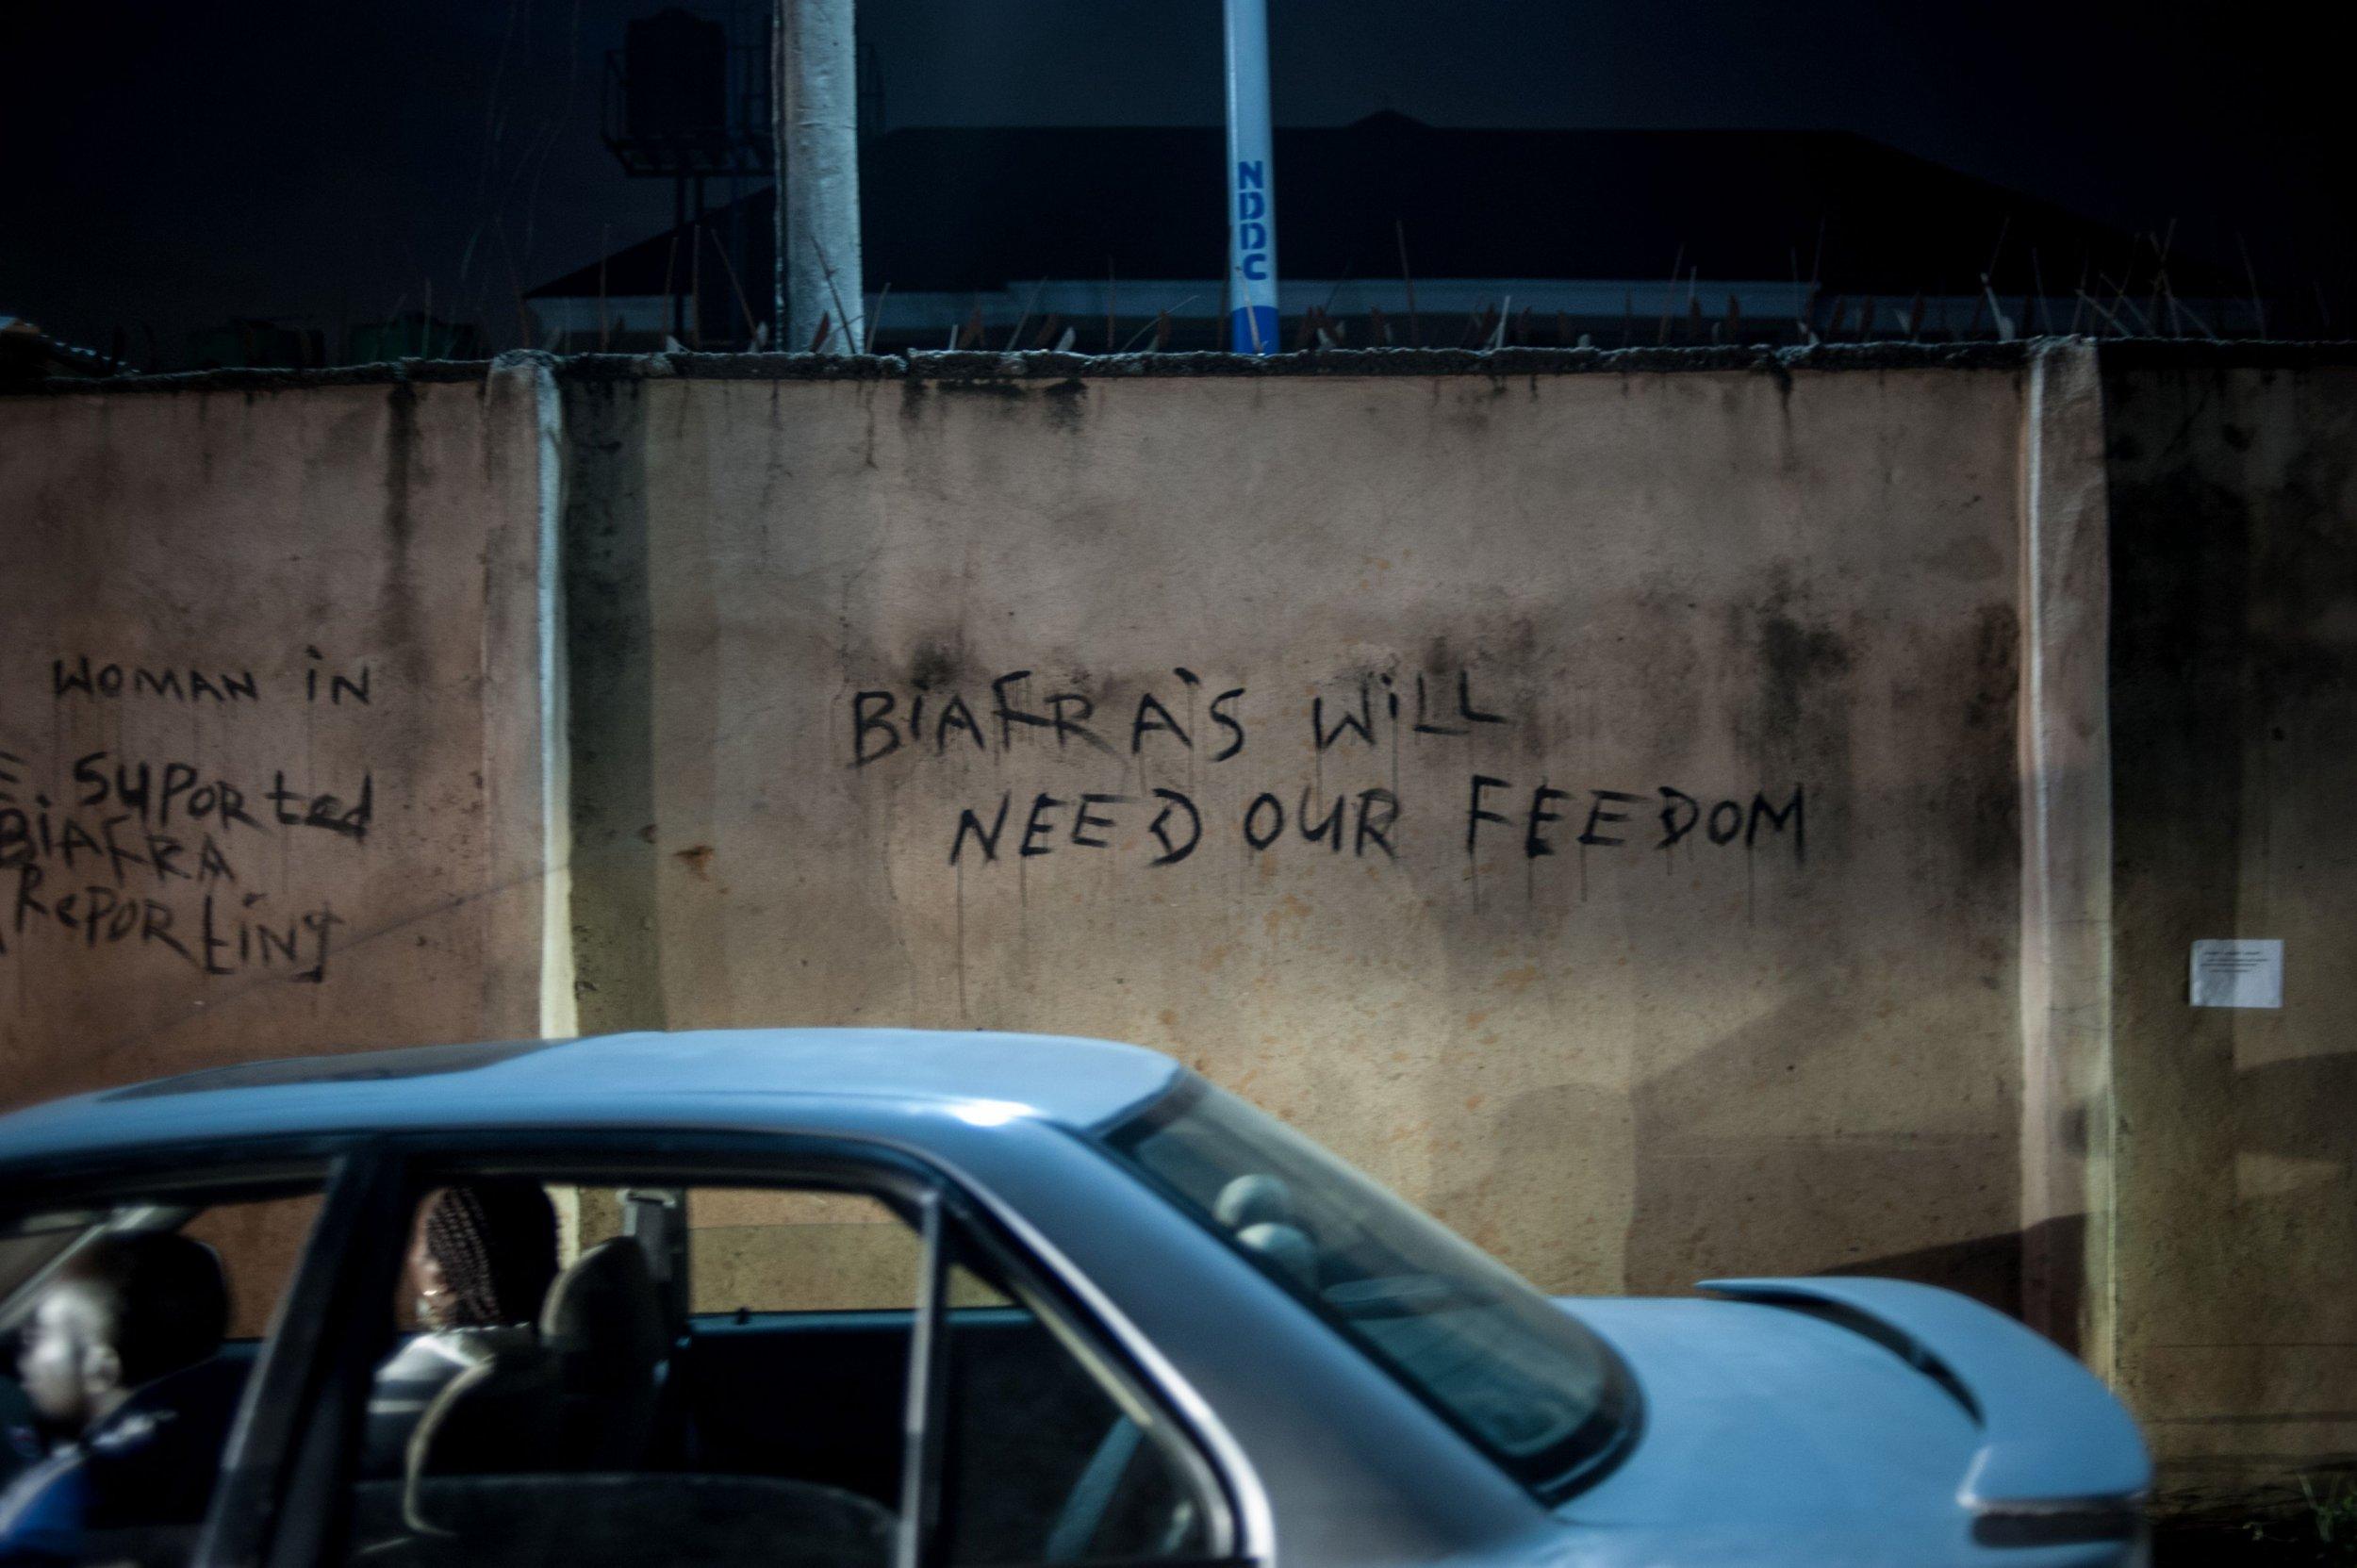 Pro-Biafra graffiti in Port Harcourt.